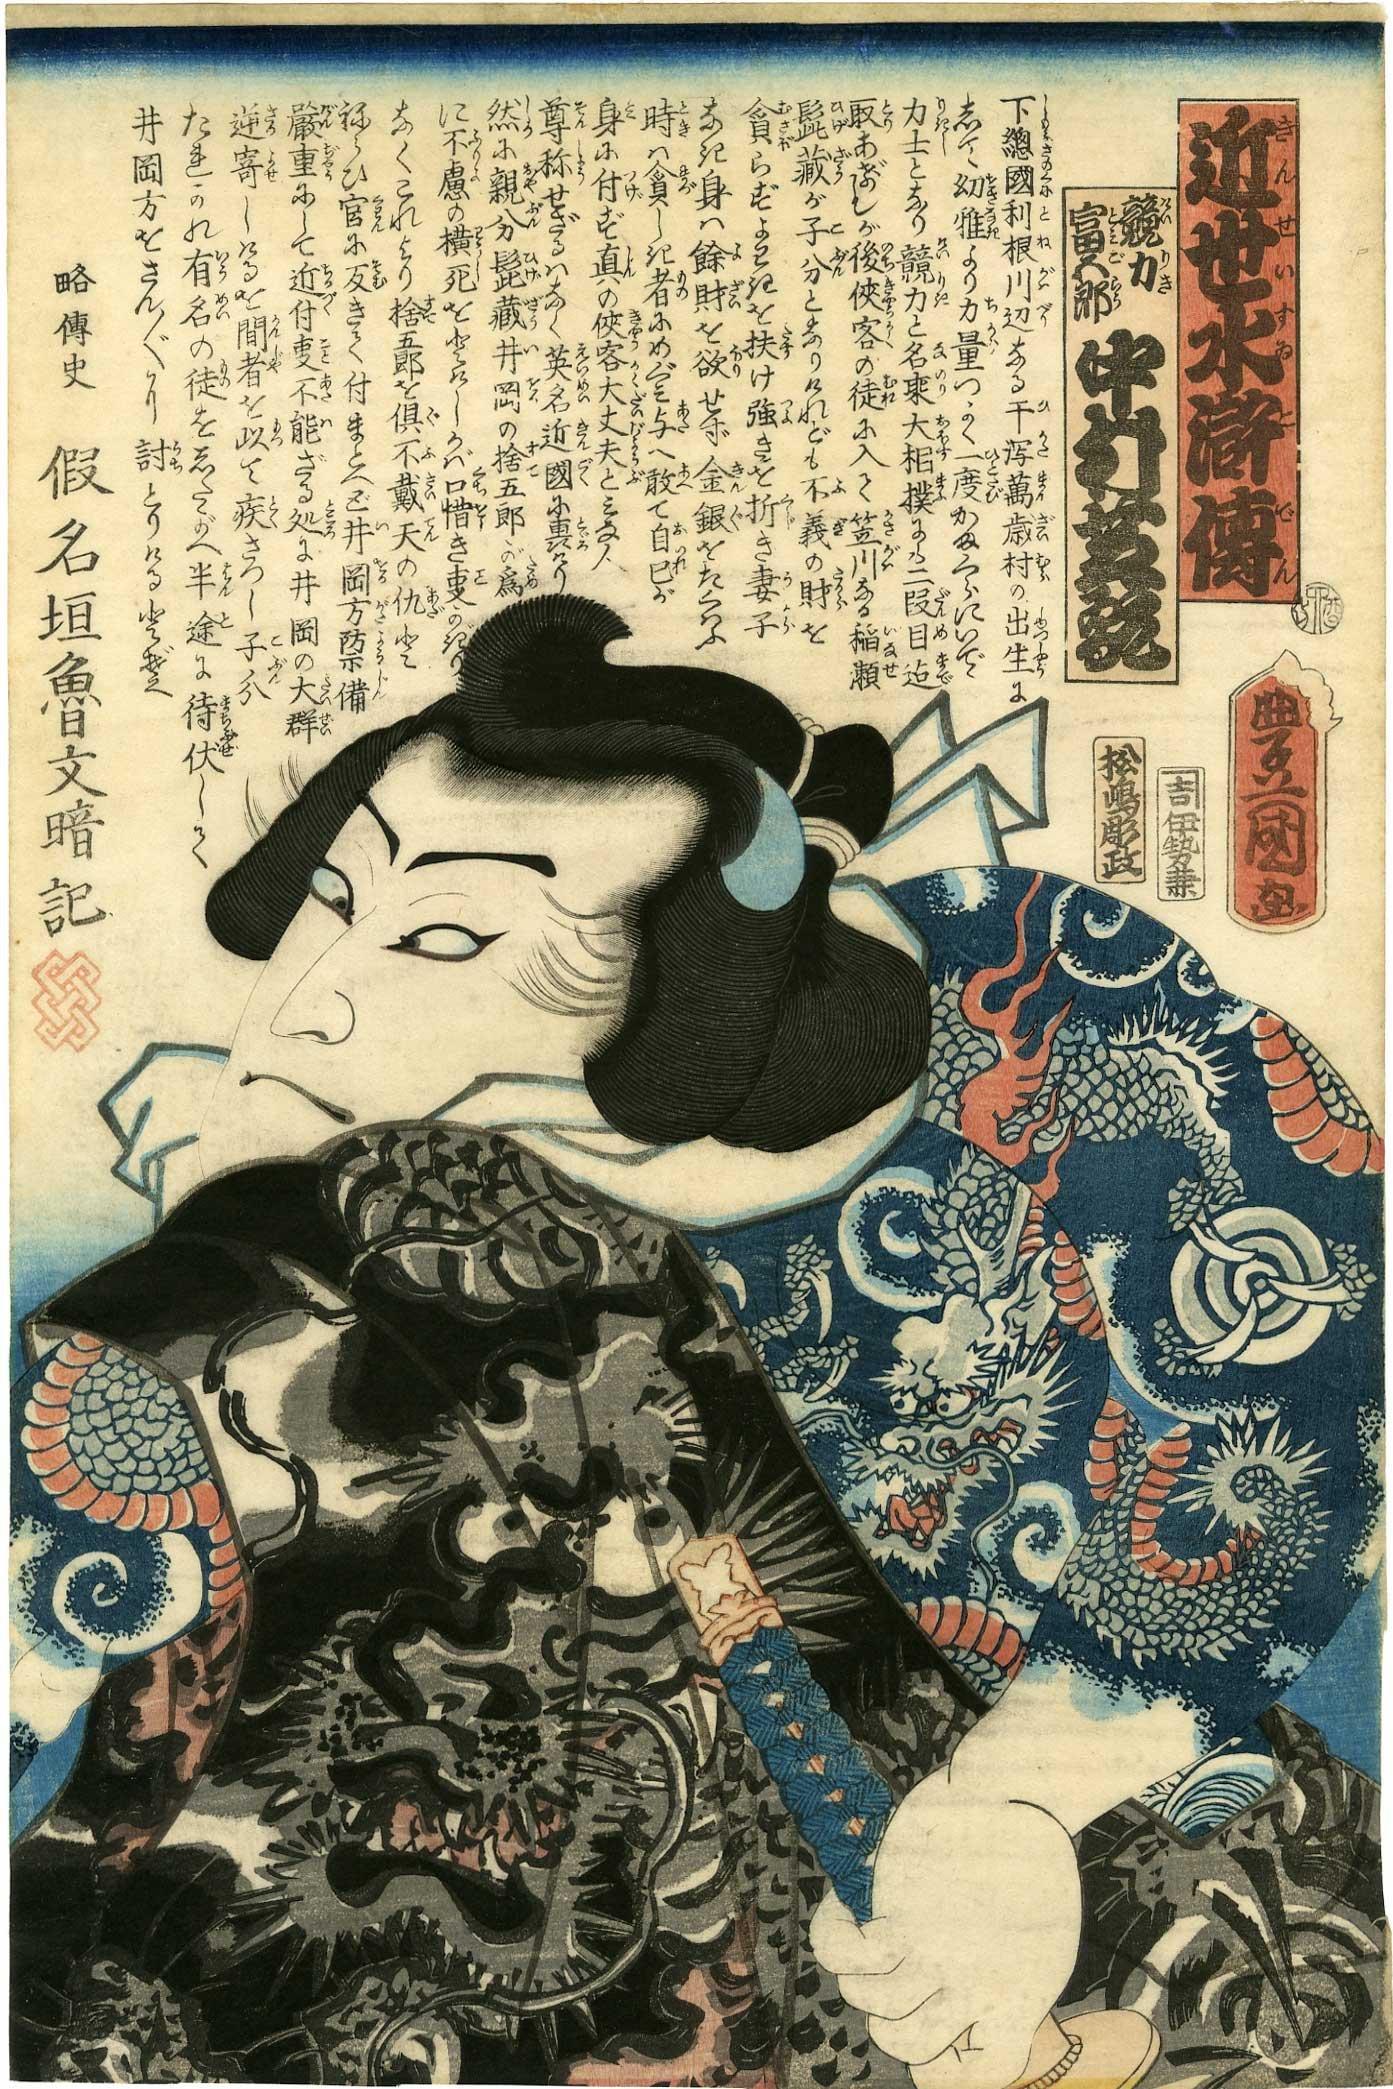 Kunisada Utagawa - Samurai Dragon Tatoo c1840s Original